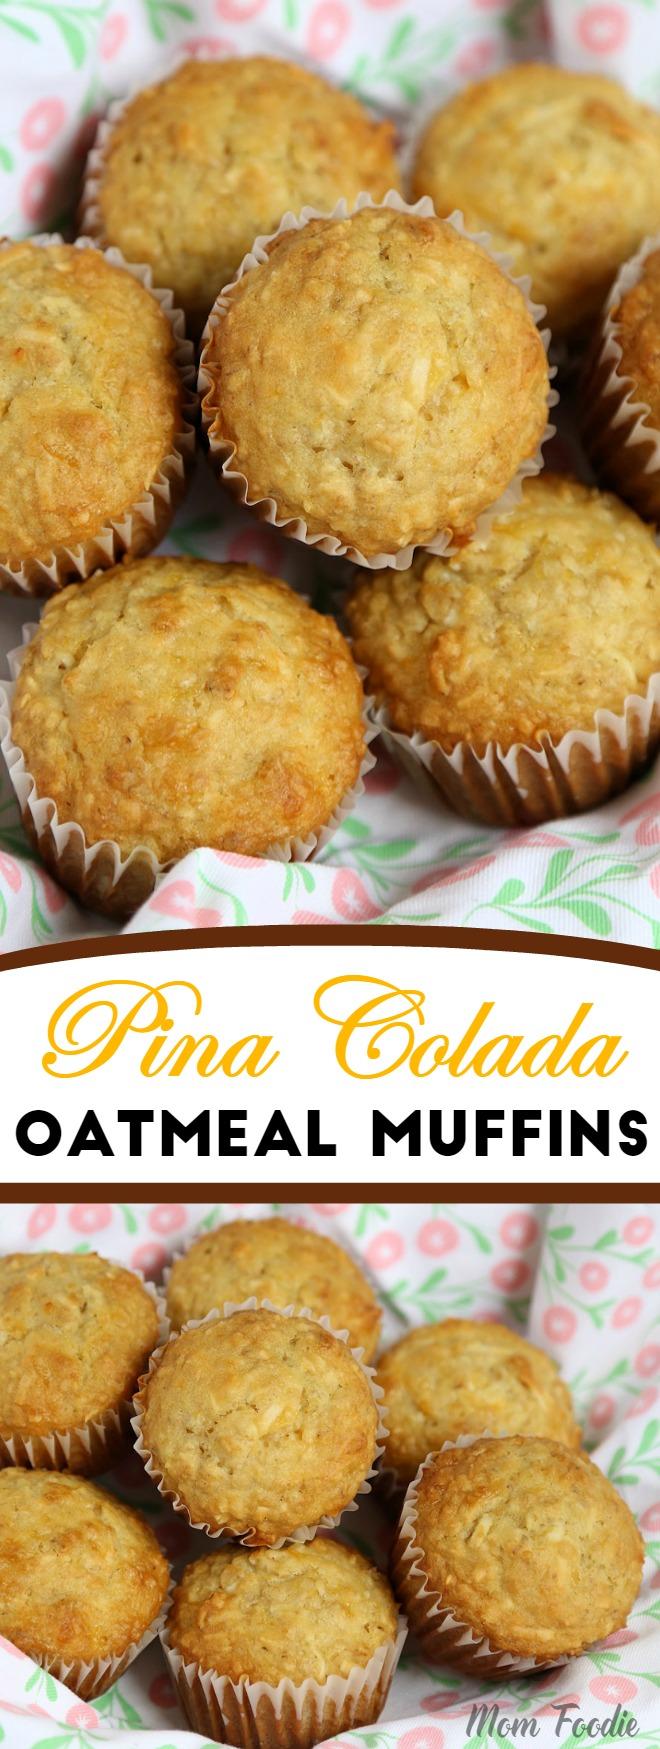 Pina Colada Muffins - Coconut Pineapple Oatmeal Muffin Recipe